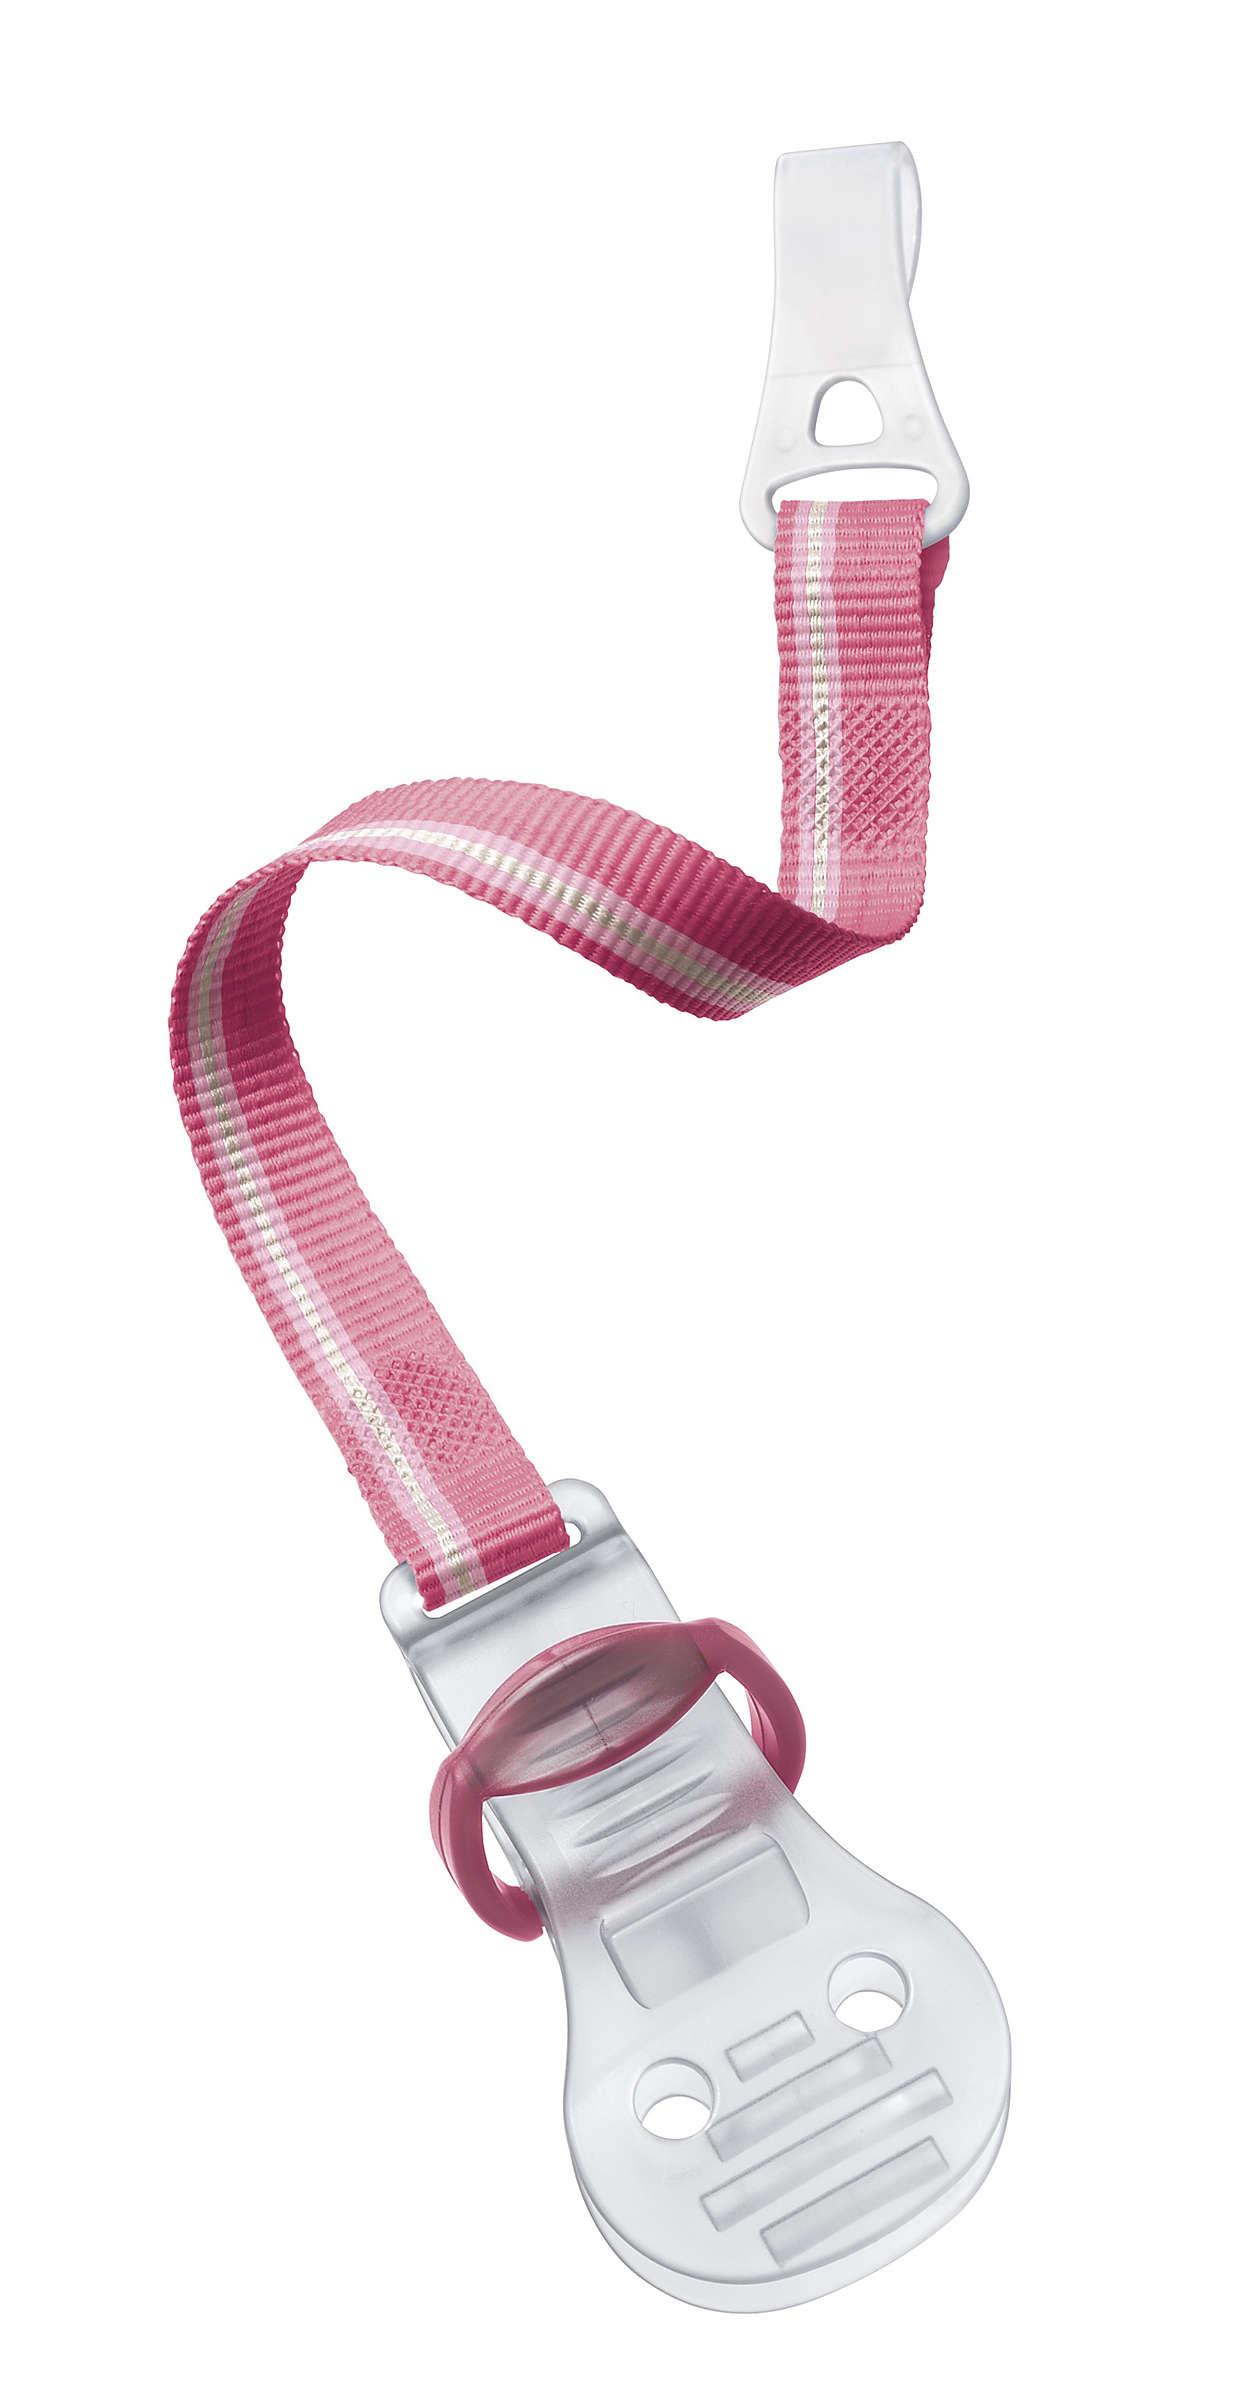 Avent Κλίπ Πιπίλας σε 3 Διαφορετικά Χρώματα 0m+ 1τεμάχιο – ροζ